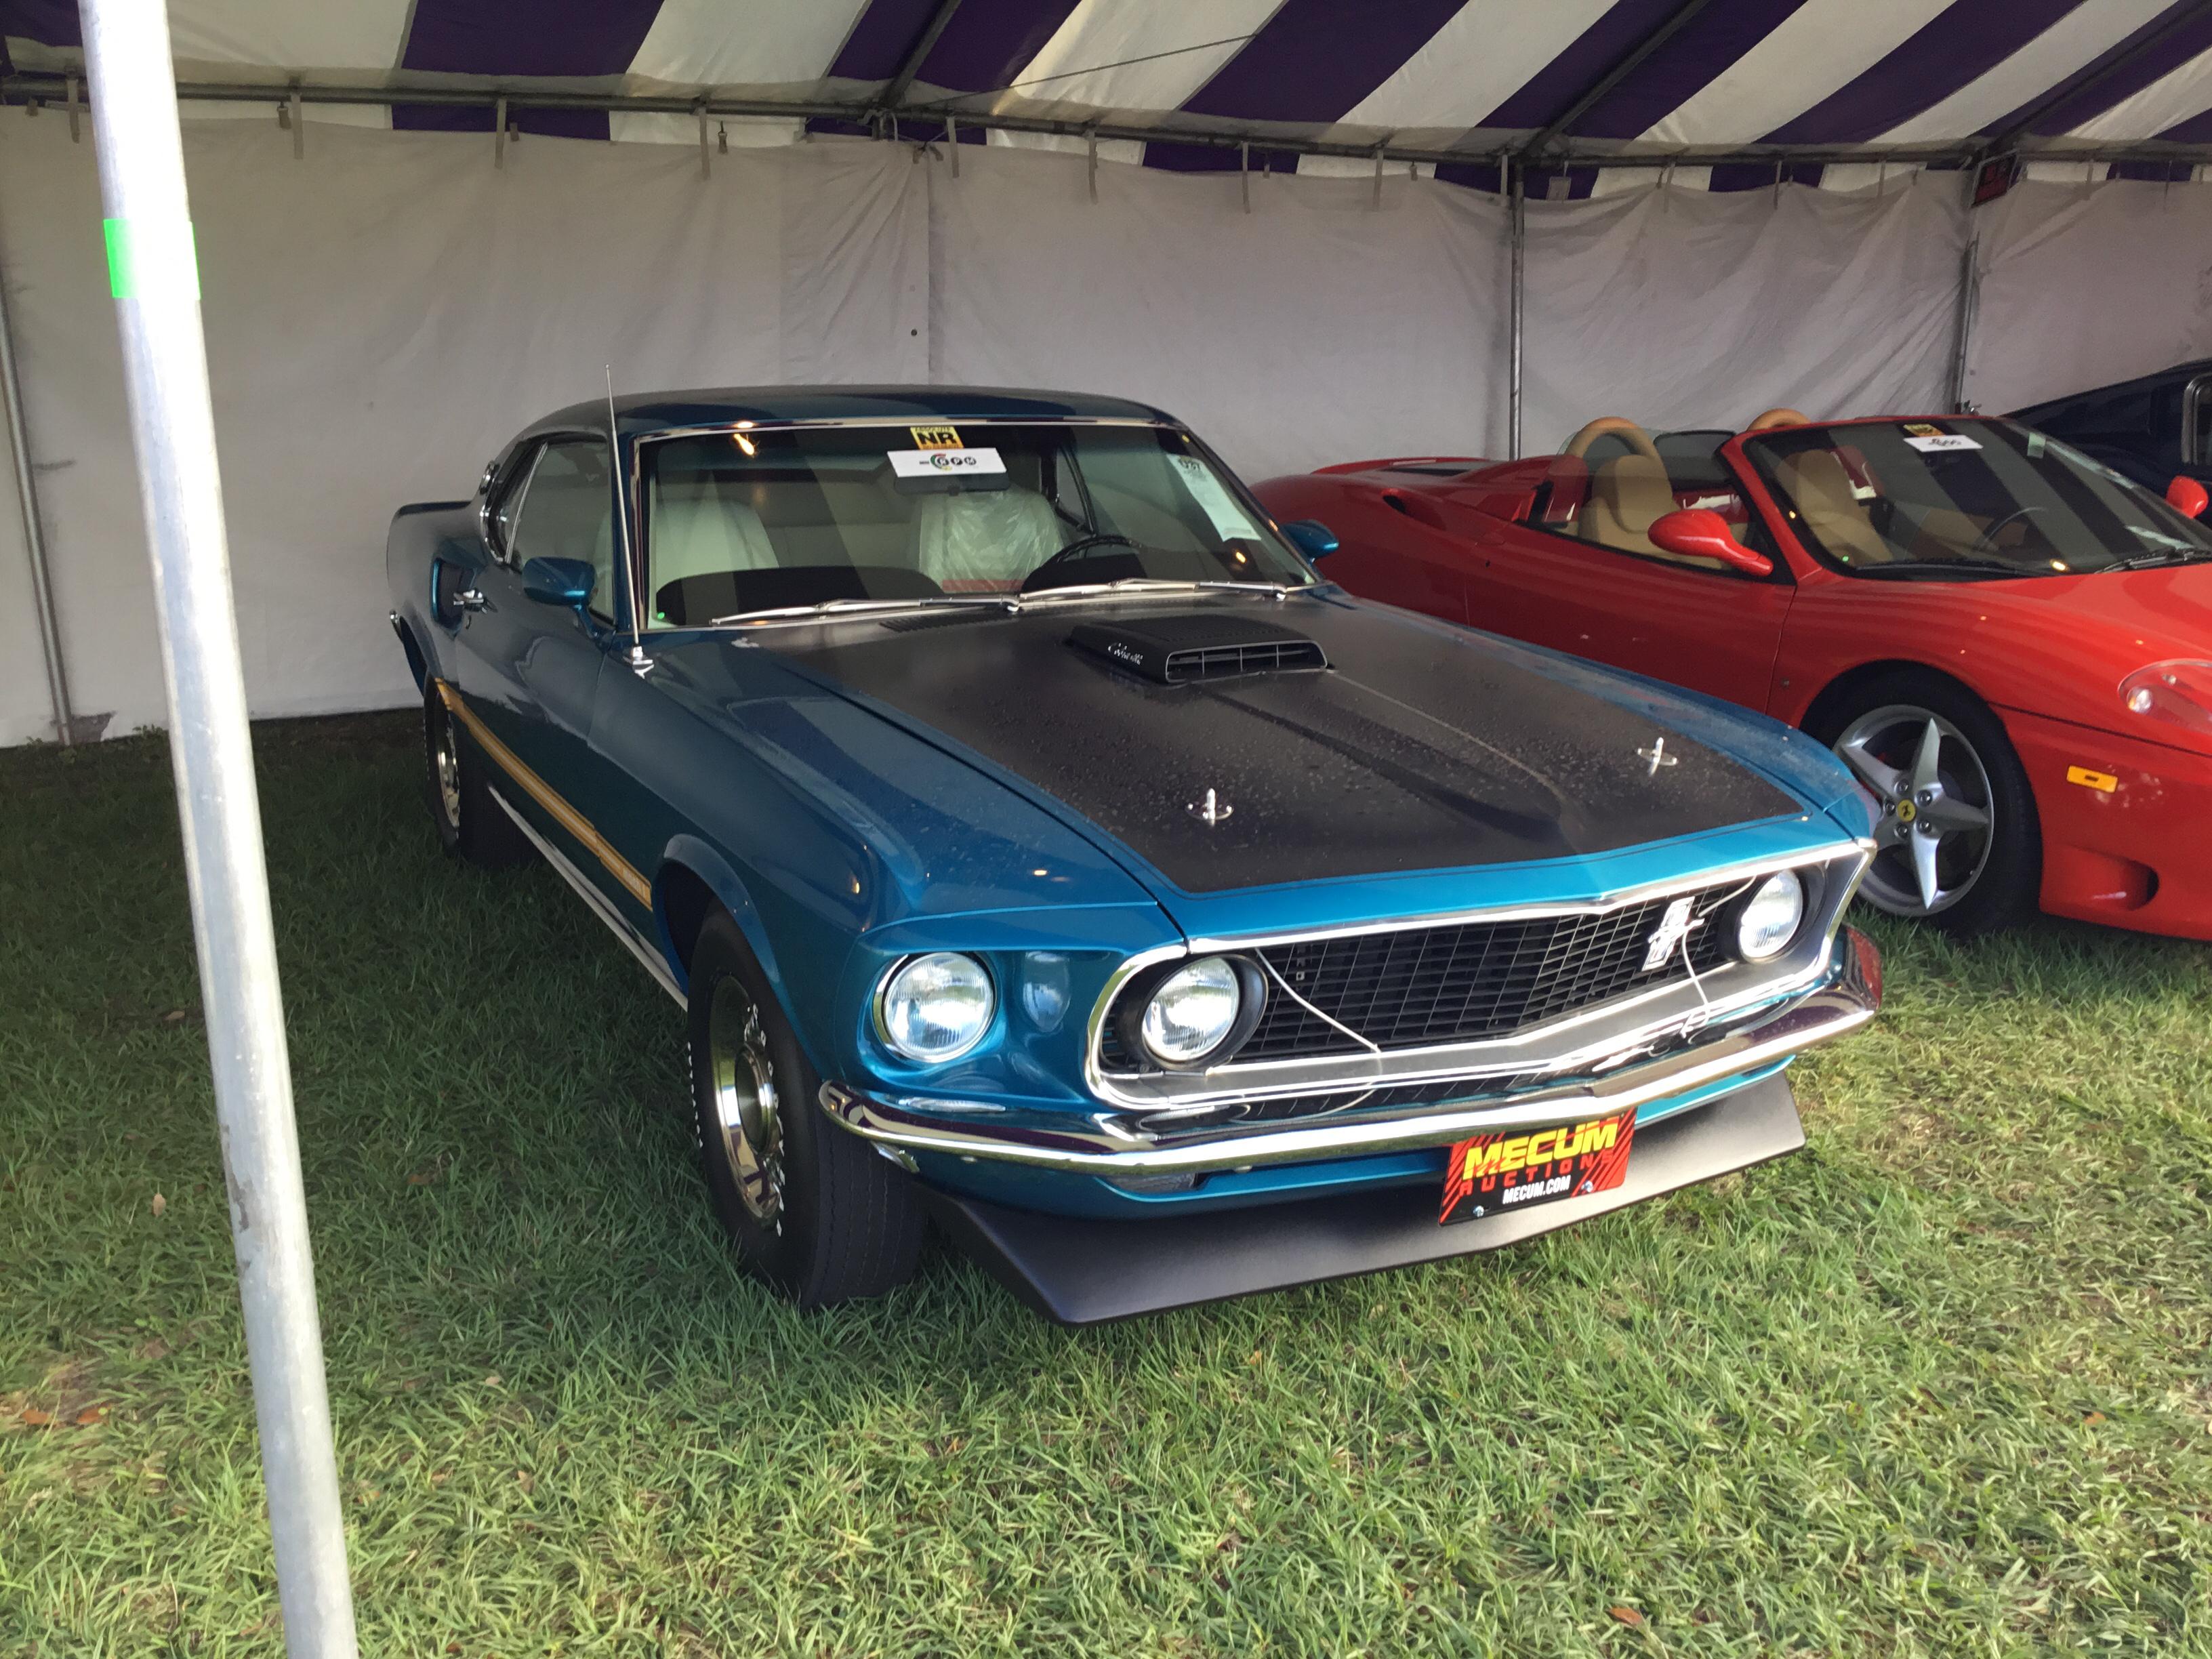 1969 Ford Mustang Mach 1 SportsRoof 8 Cyl 428cid 360hp 4bbl Super Cobra Jet